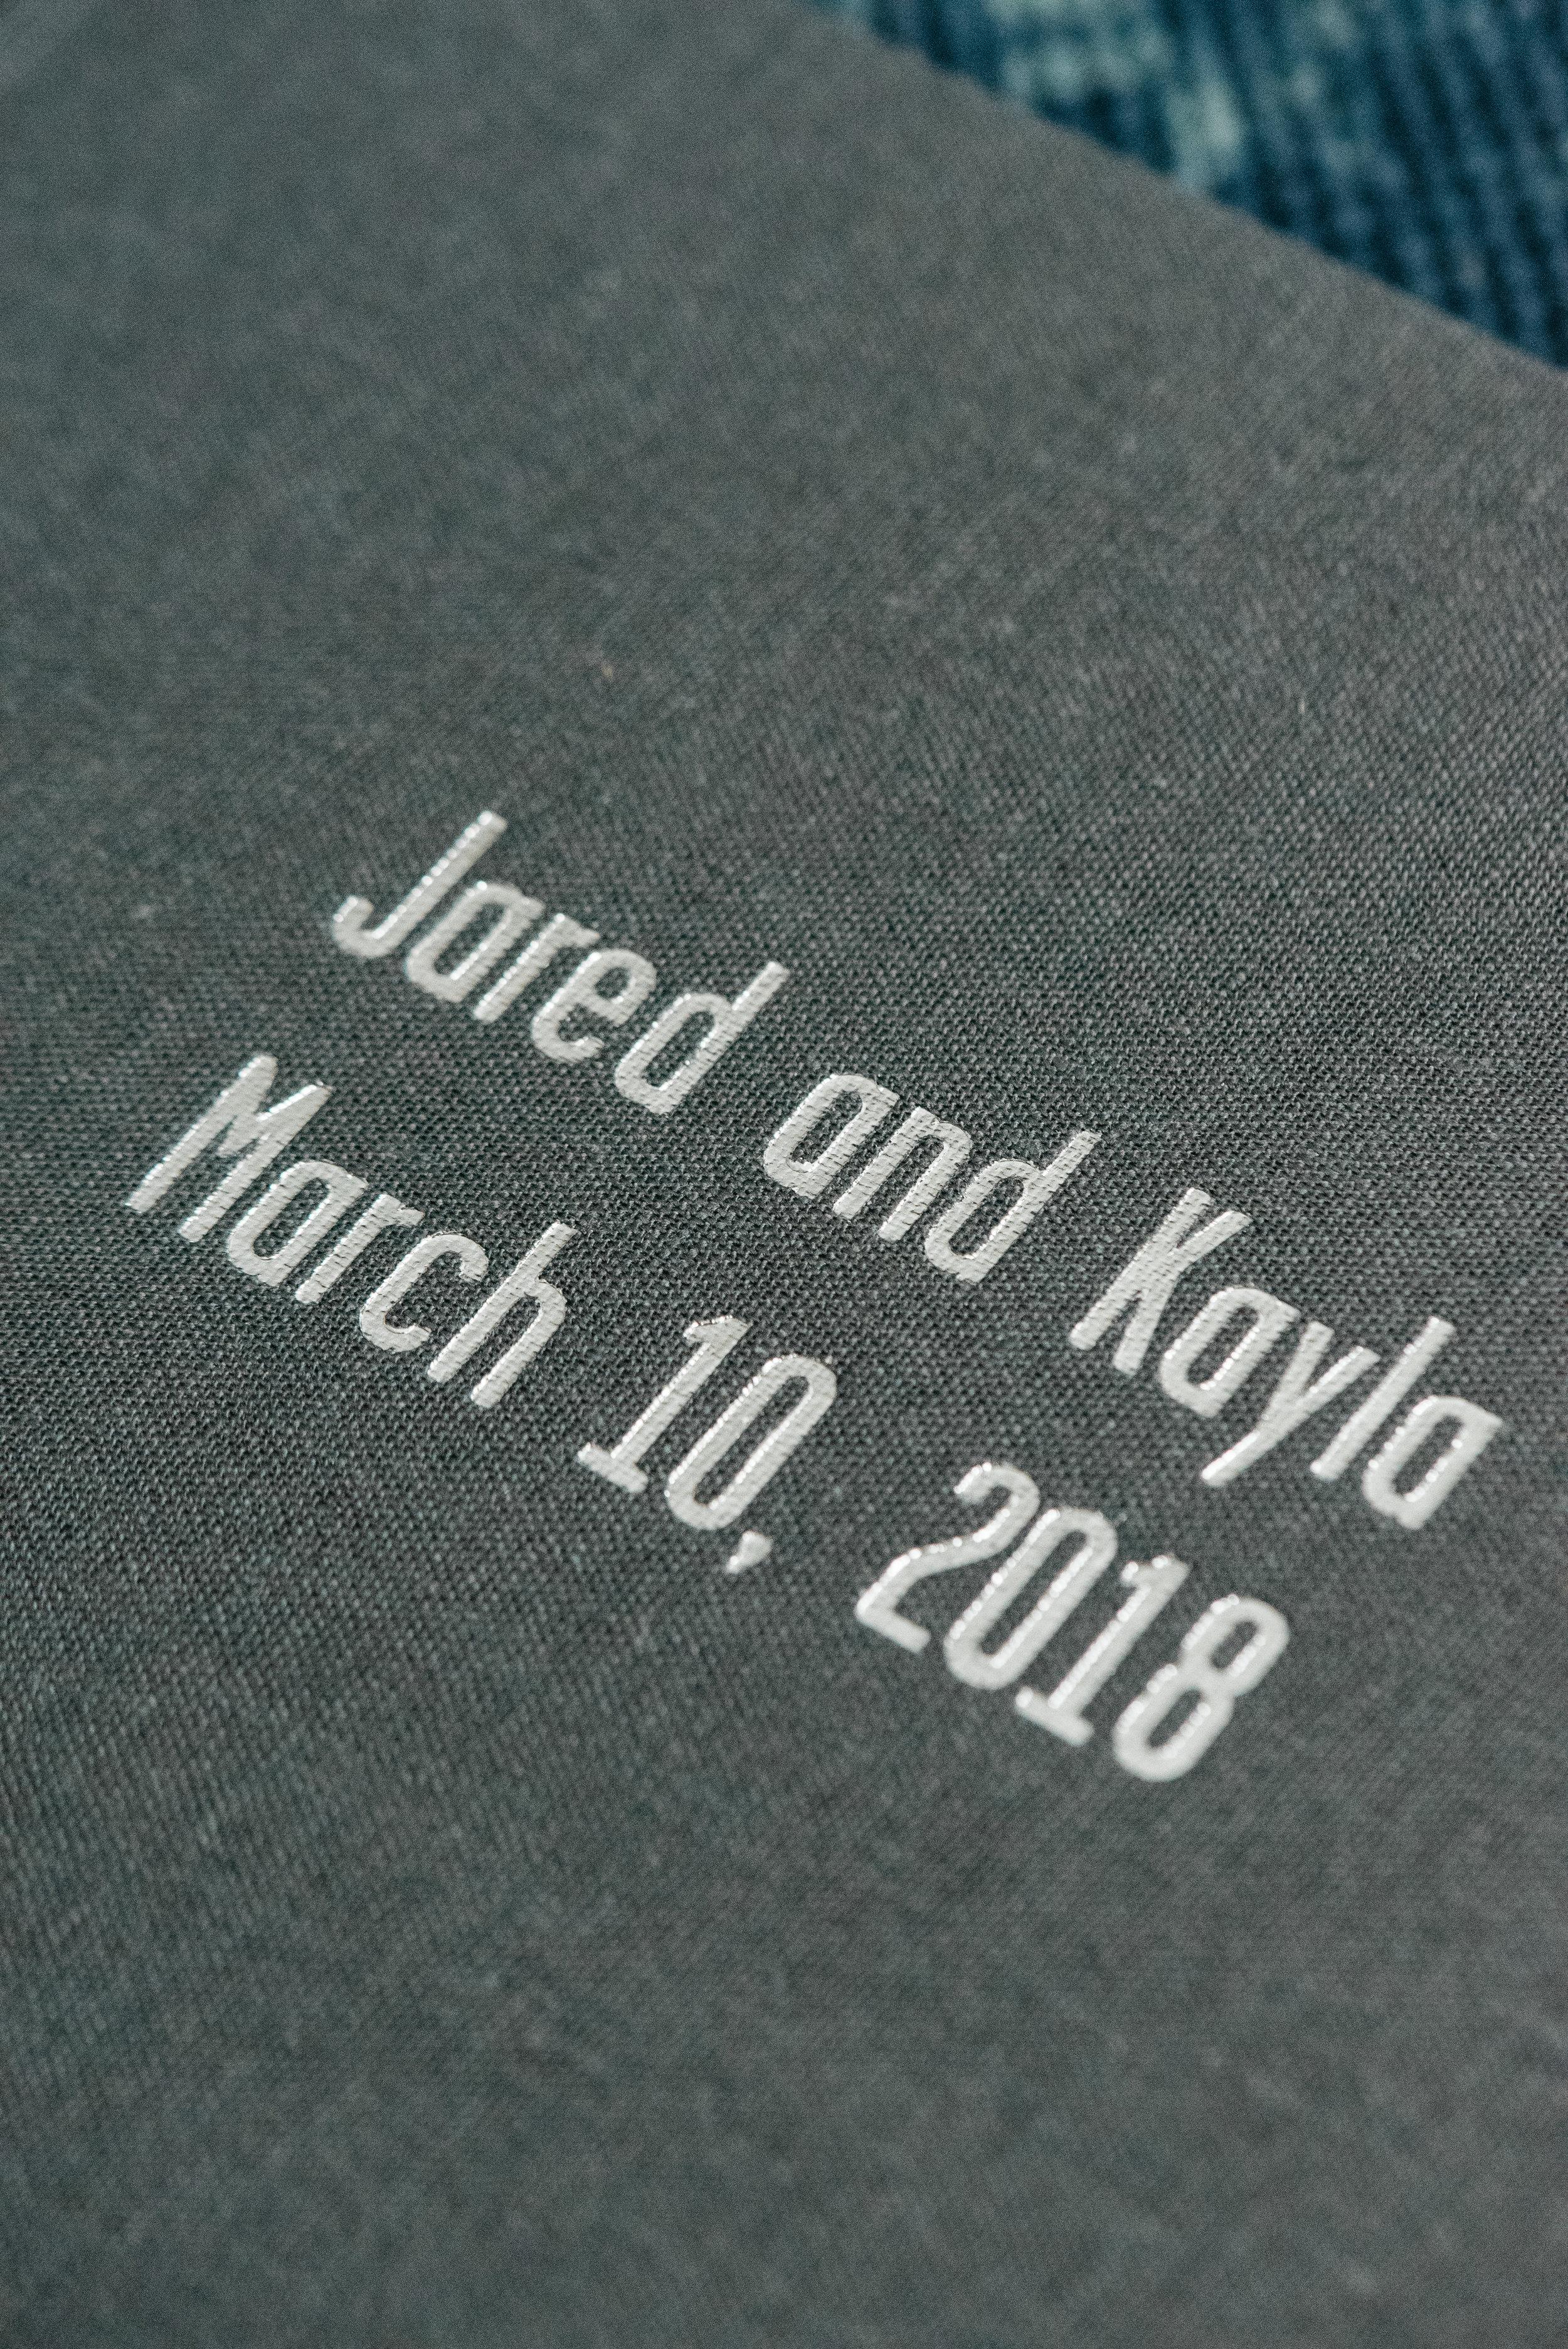 albums-march-4.jpg